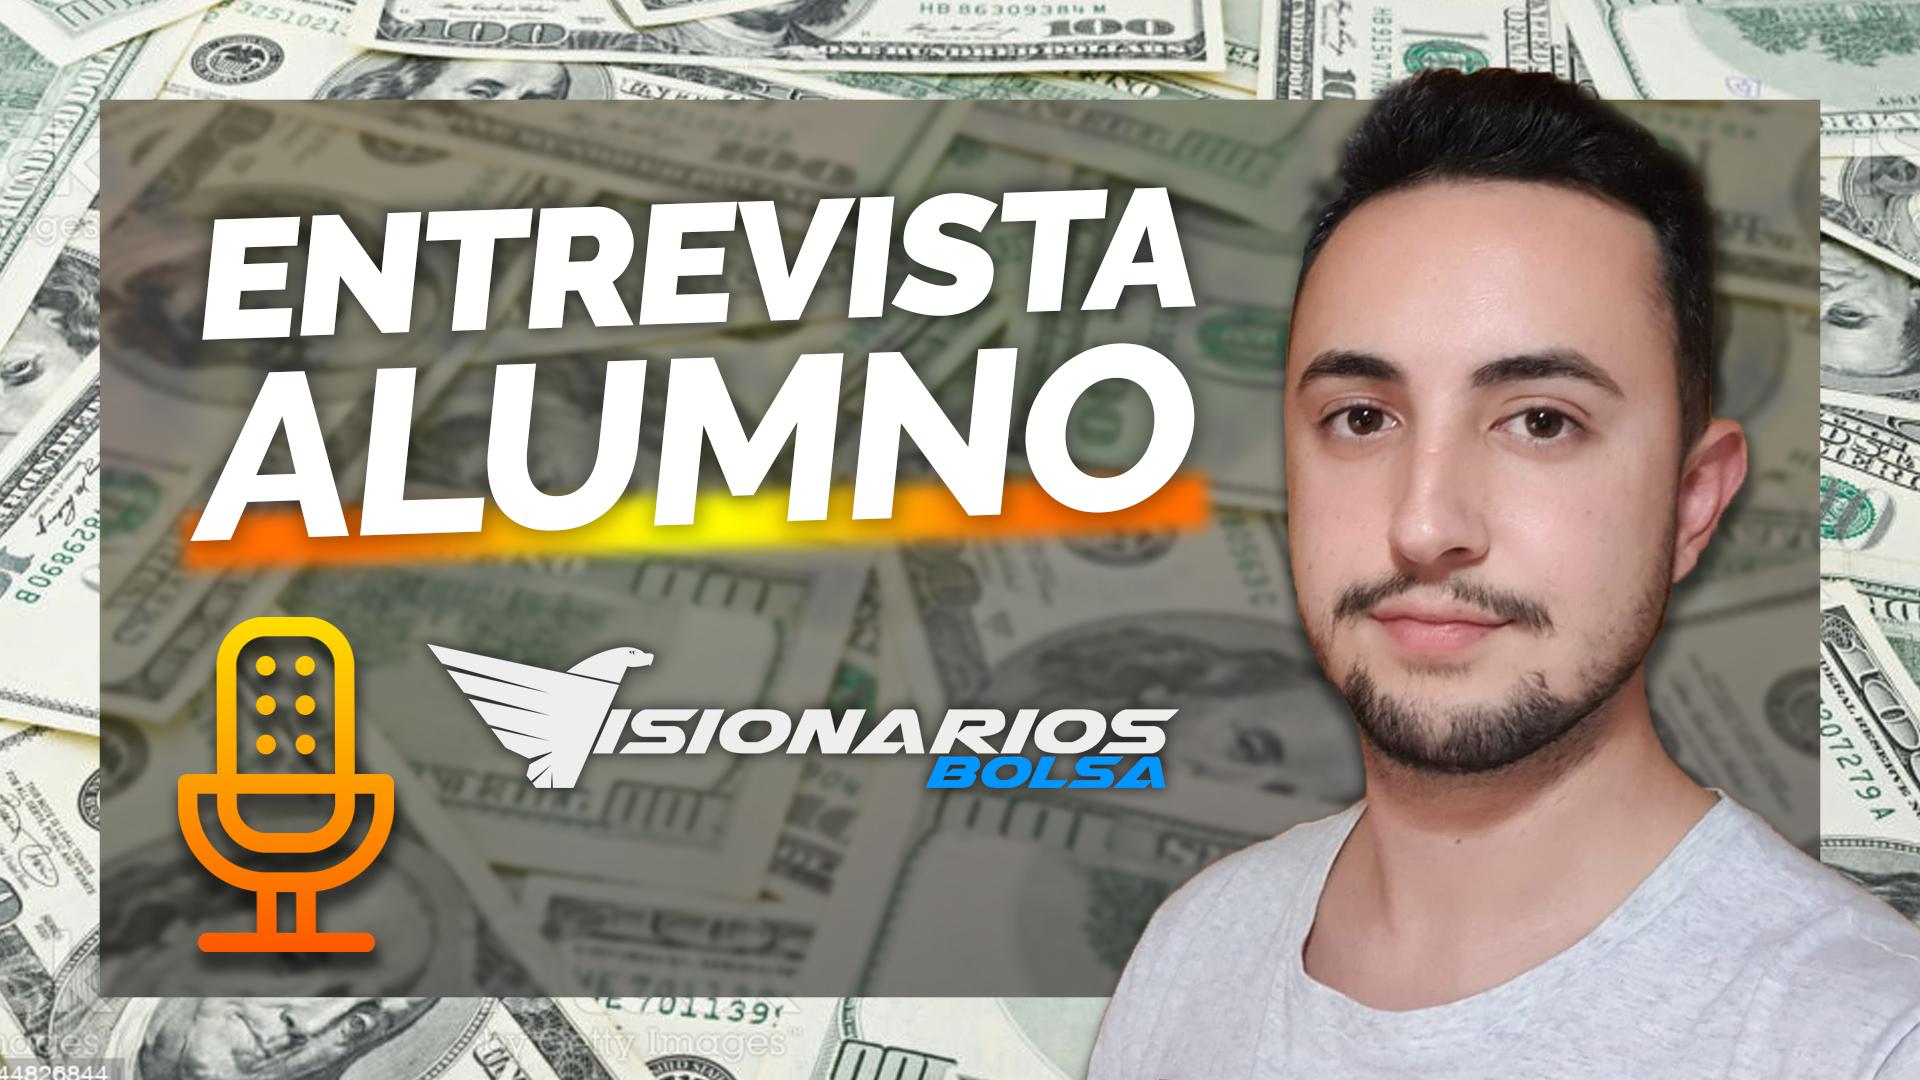 Empecé A Invertir En Bolsa Con 500€ | Entrevista Ángel Muñoz